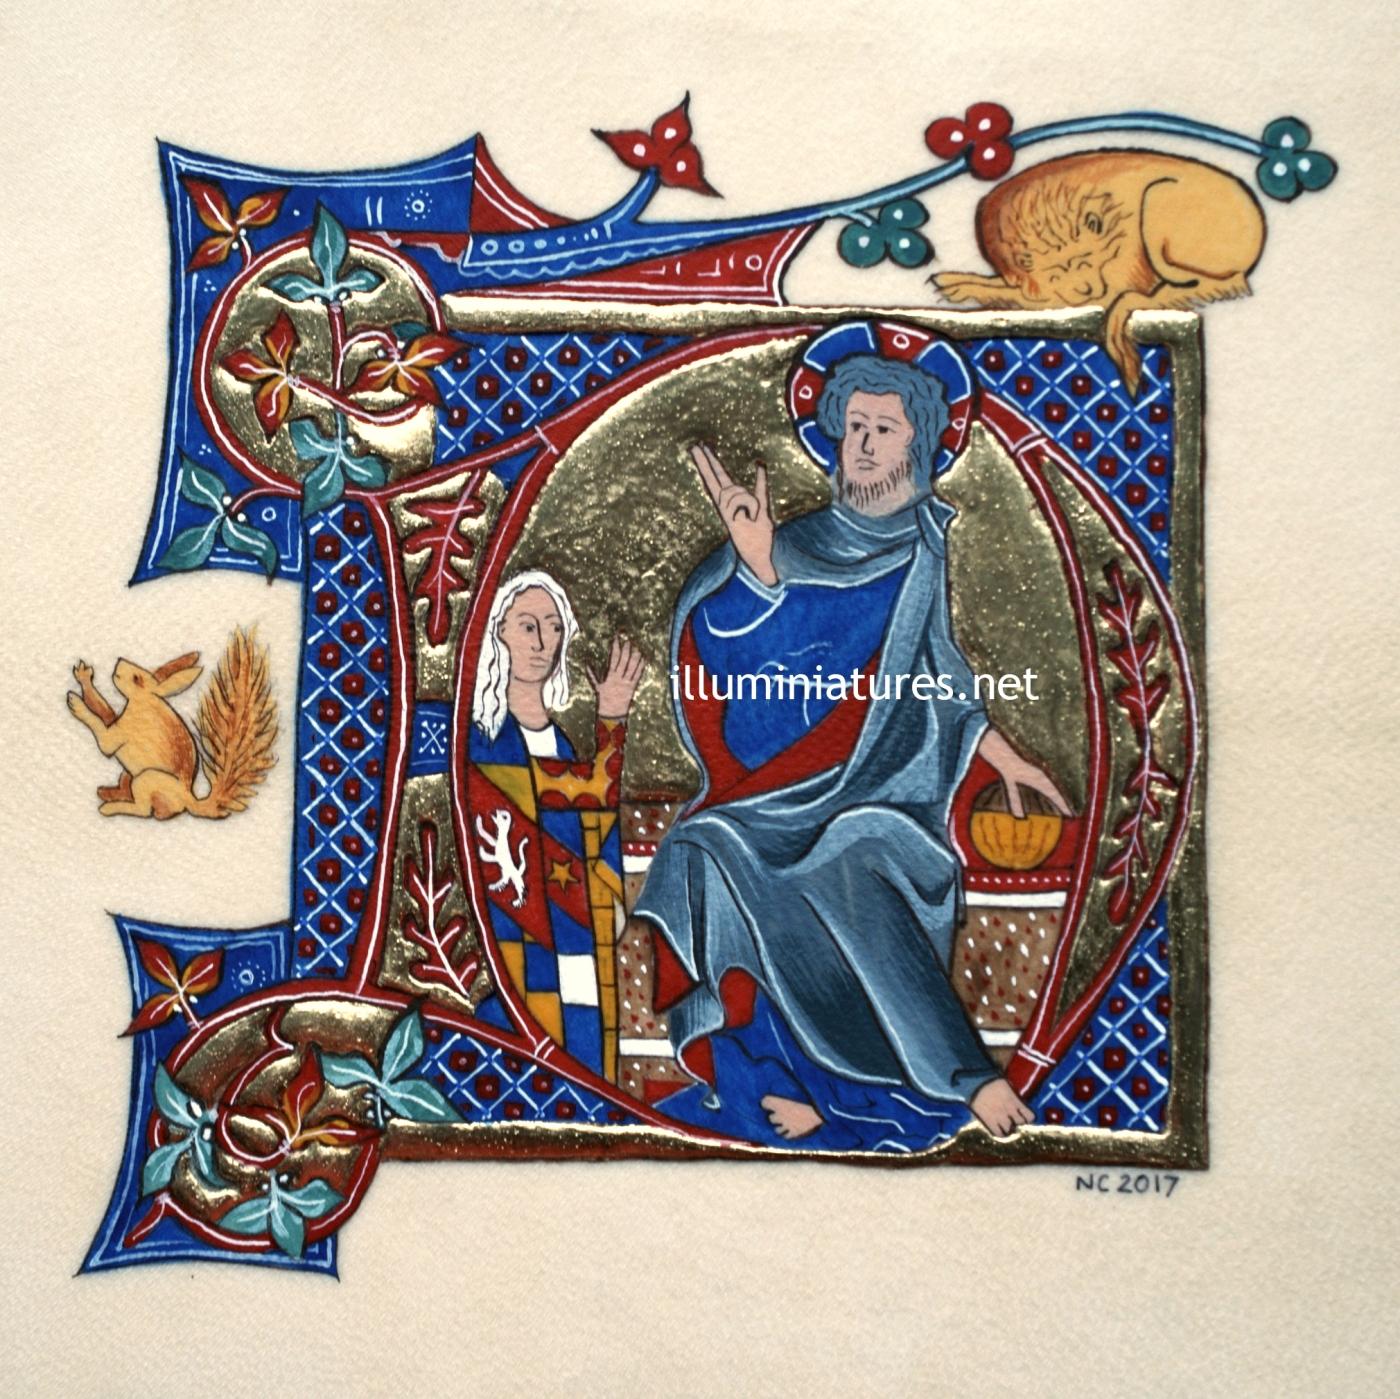 D initial from the Grey-Fitzpayn Book of Hours / Initiale D du Livre d'Heures de Grey-Fitzpayn